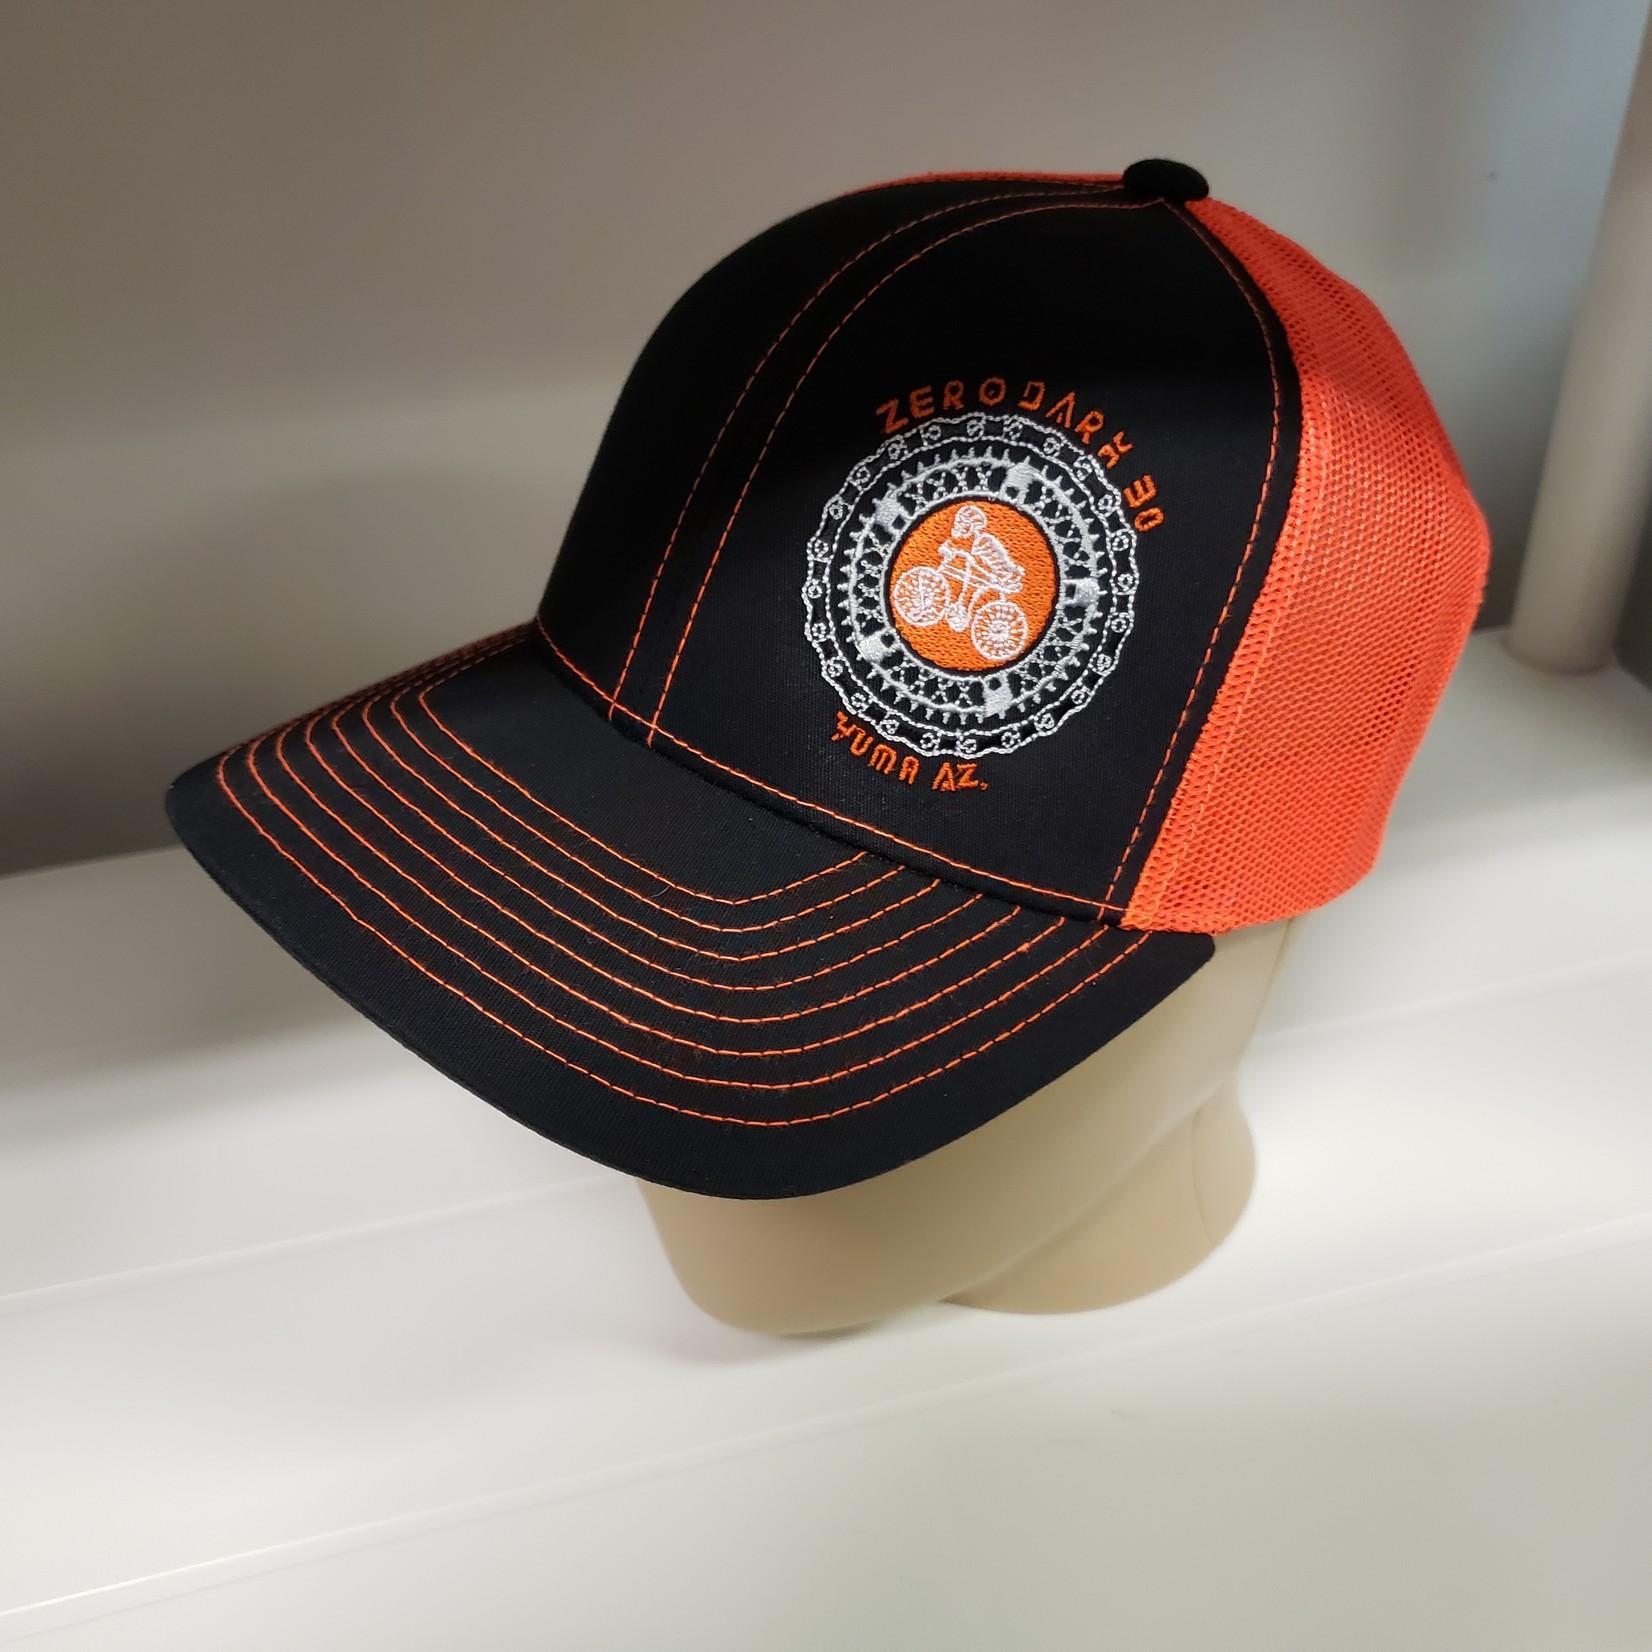 Richardson Hat - ZD30 - Orange/Blk - Snapback